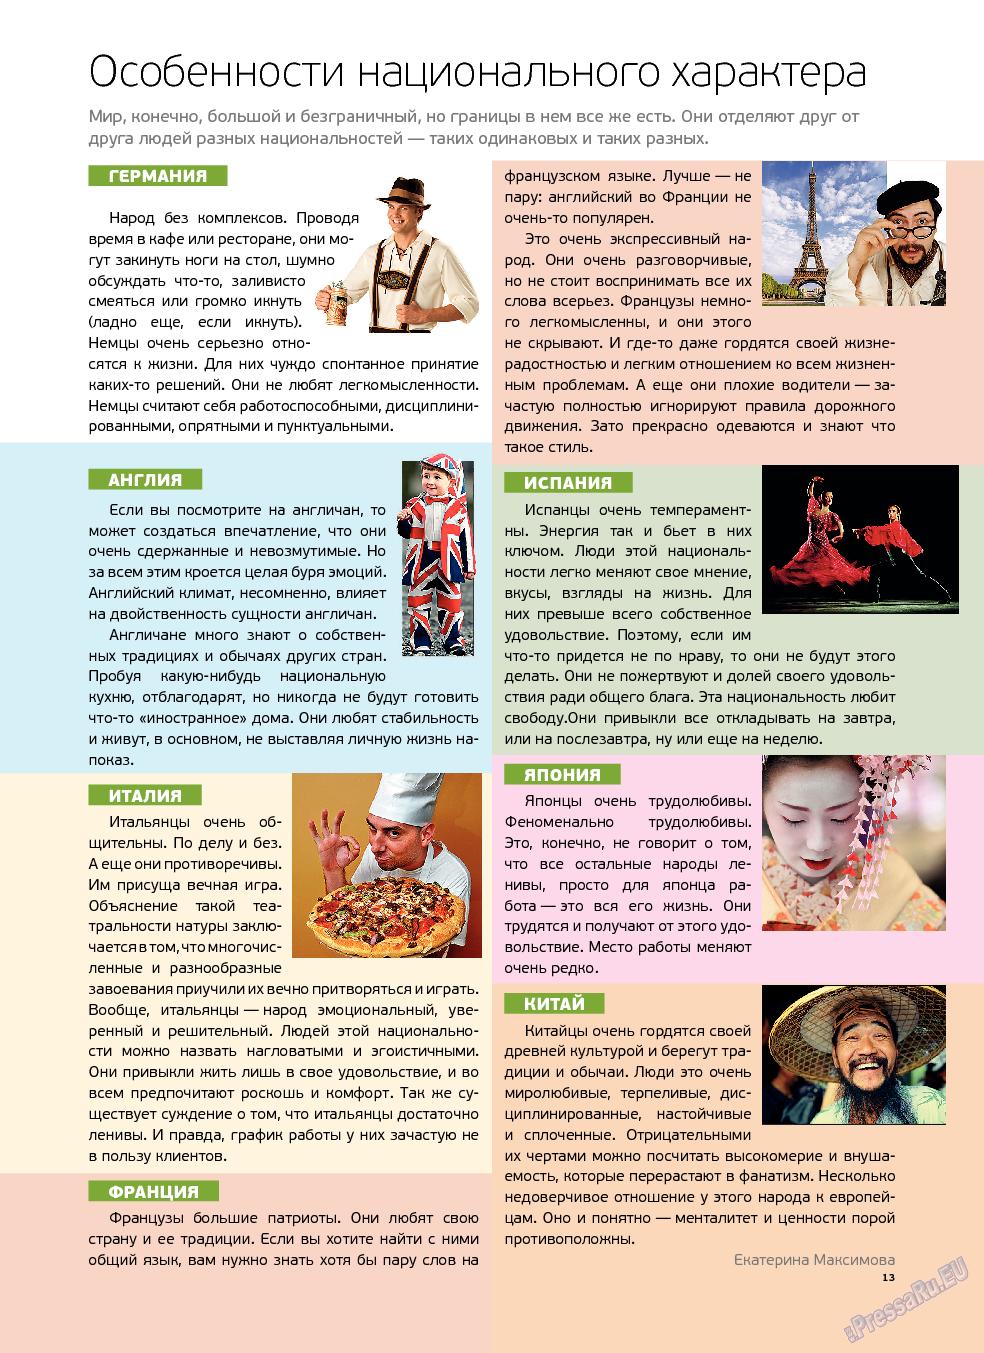 Артек (журнал). 2013 год, номер 2, стр. 15